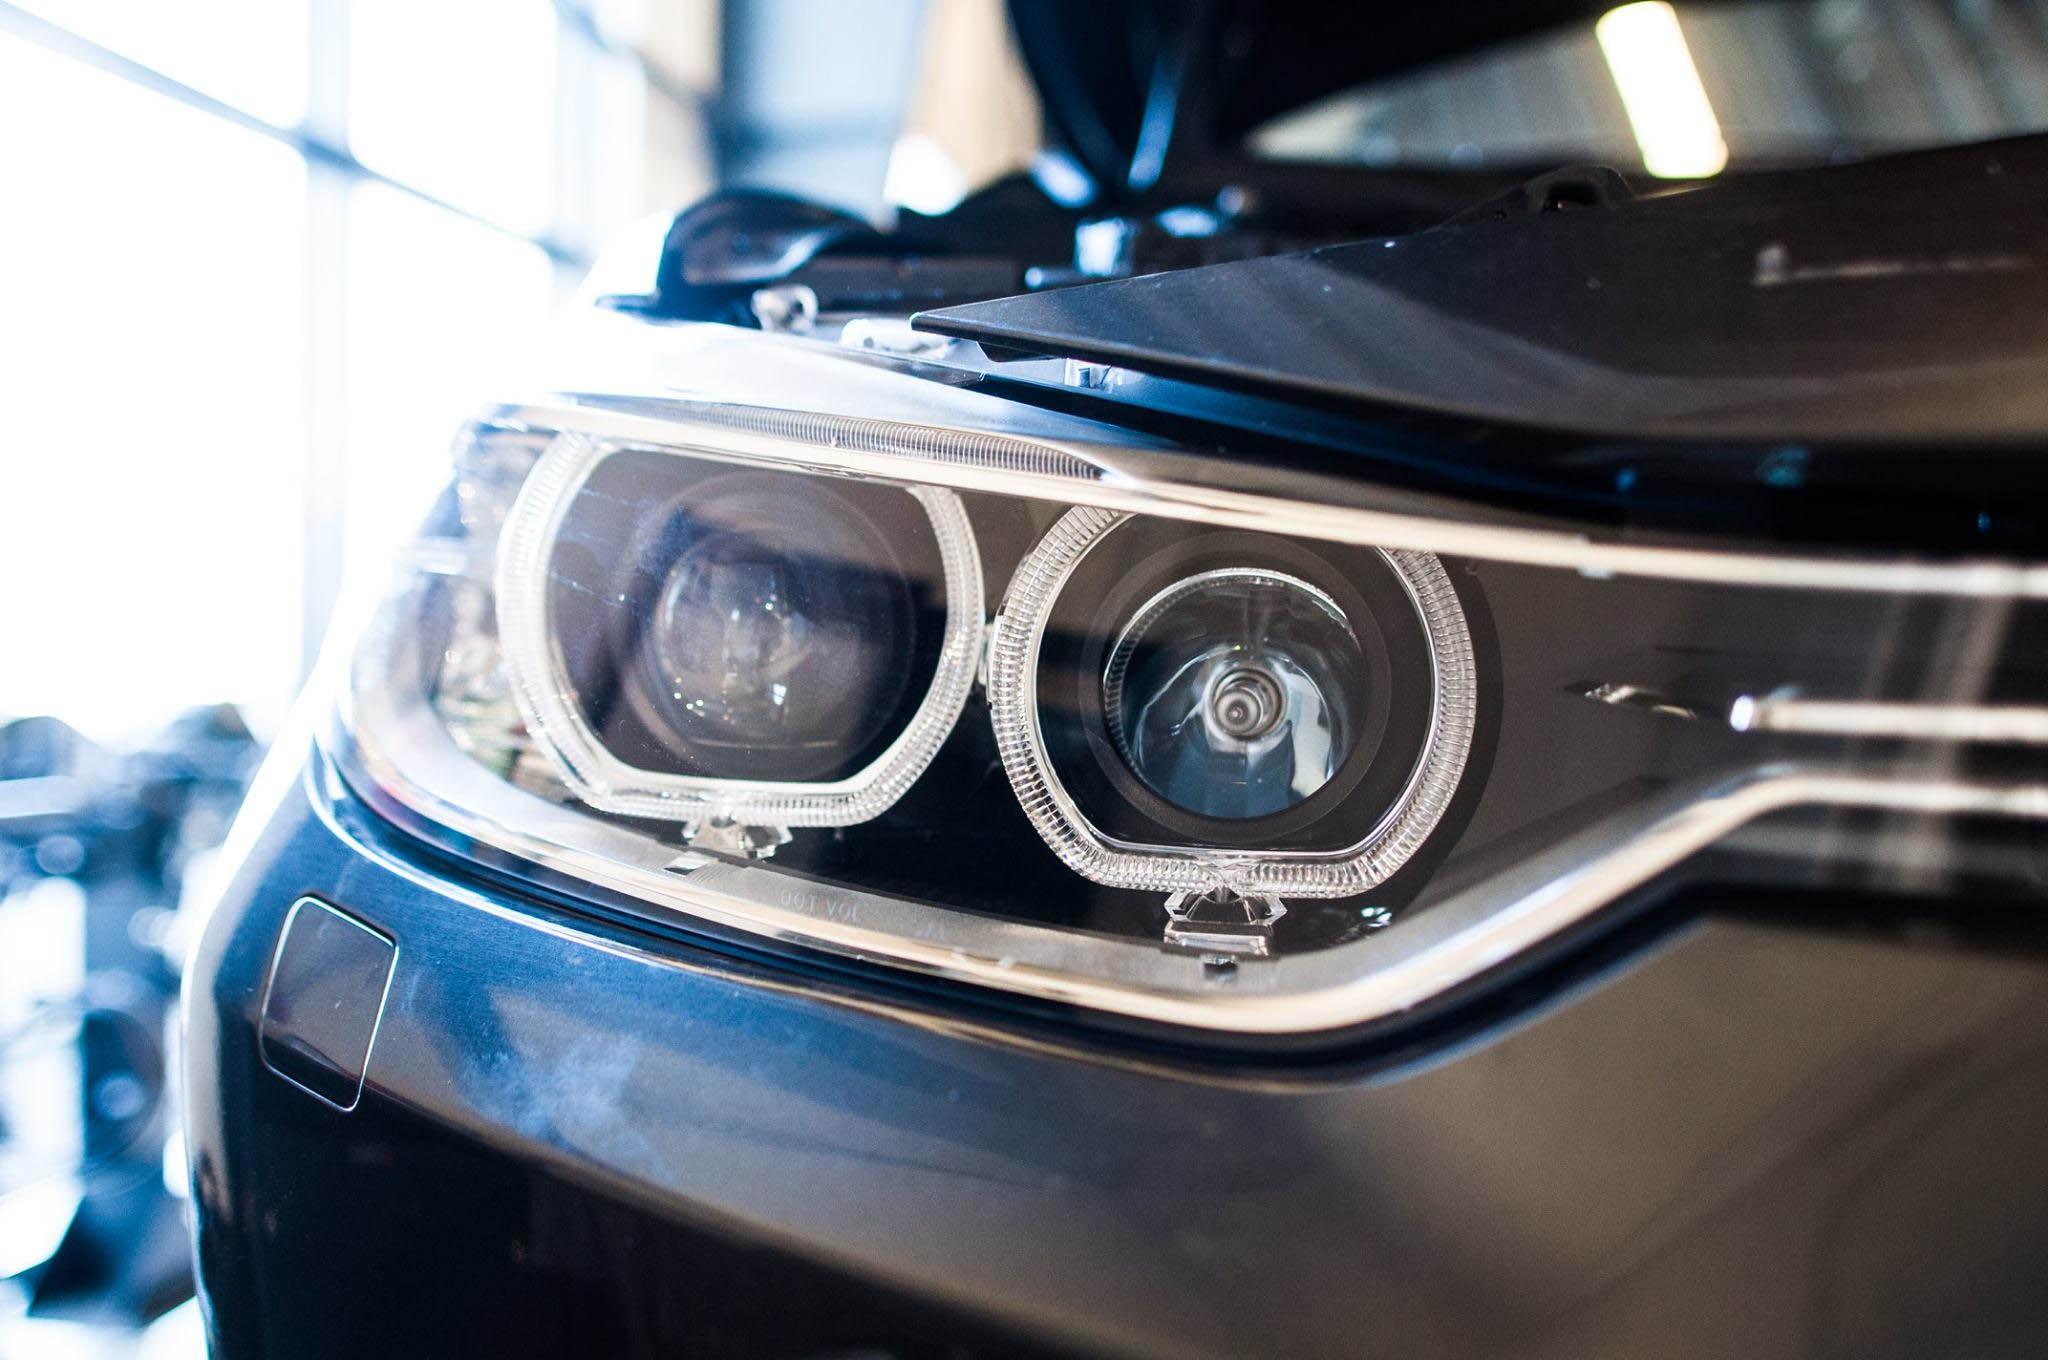 depo-bmw-xenon-projector-f30-f31-angel-eyes-headlights-uk.jpg